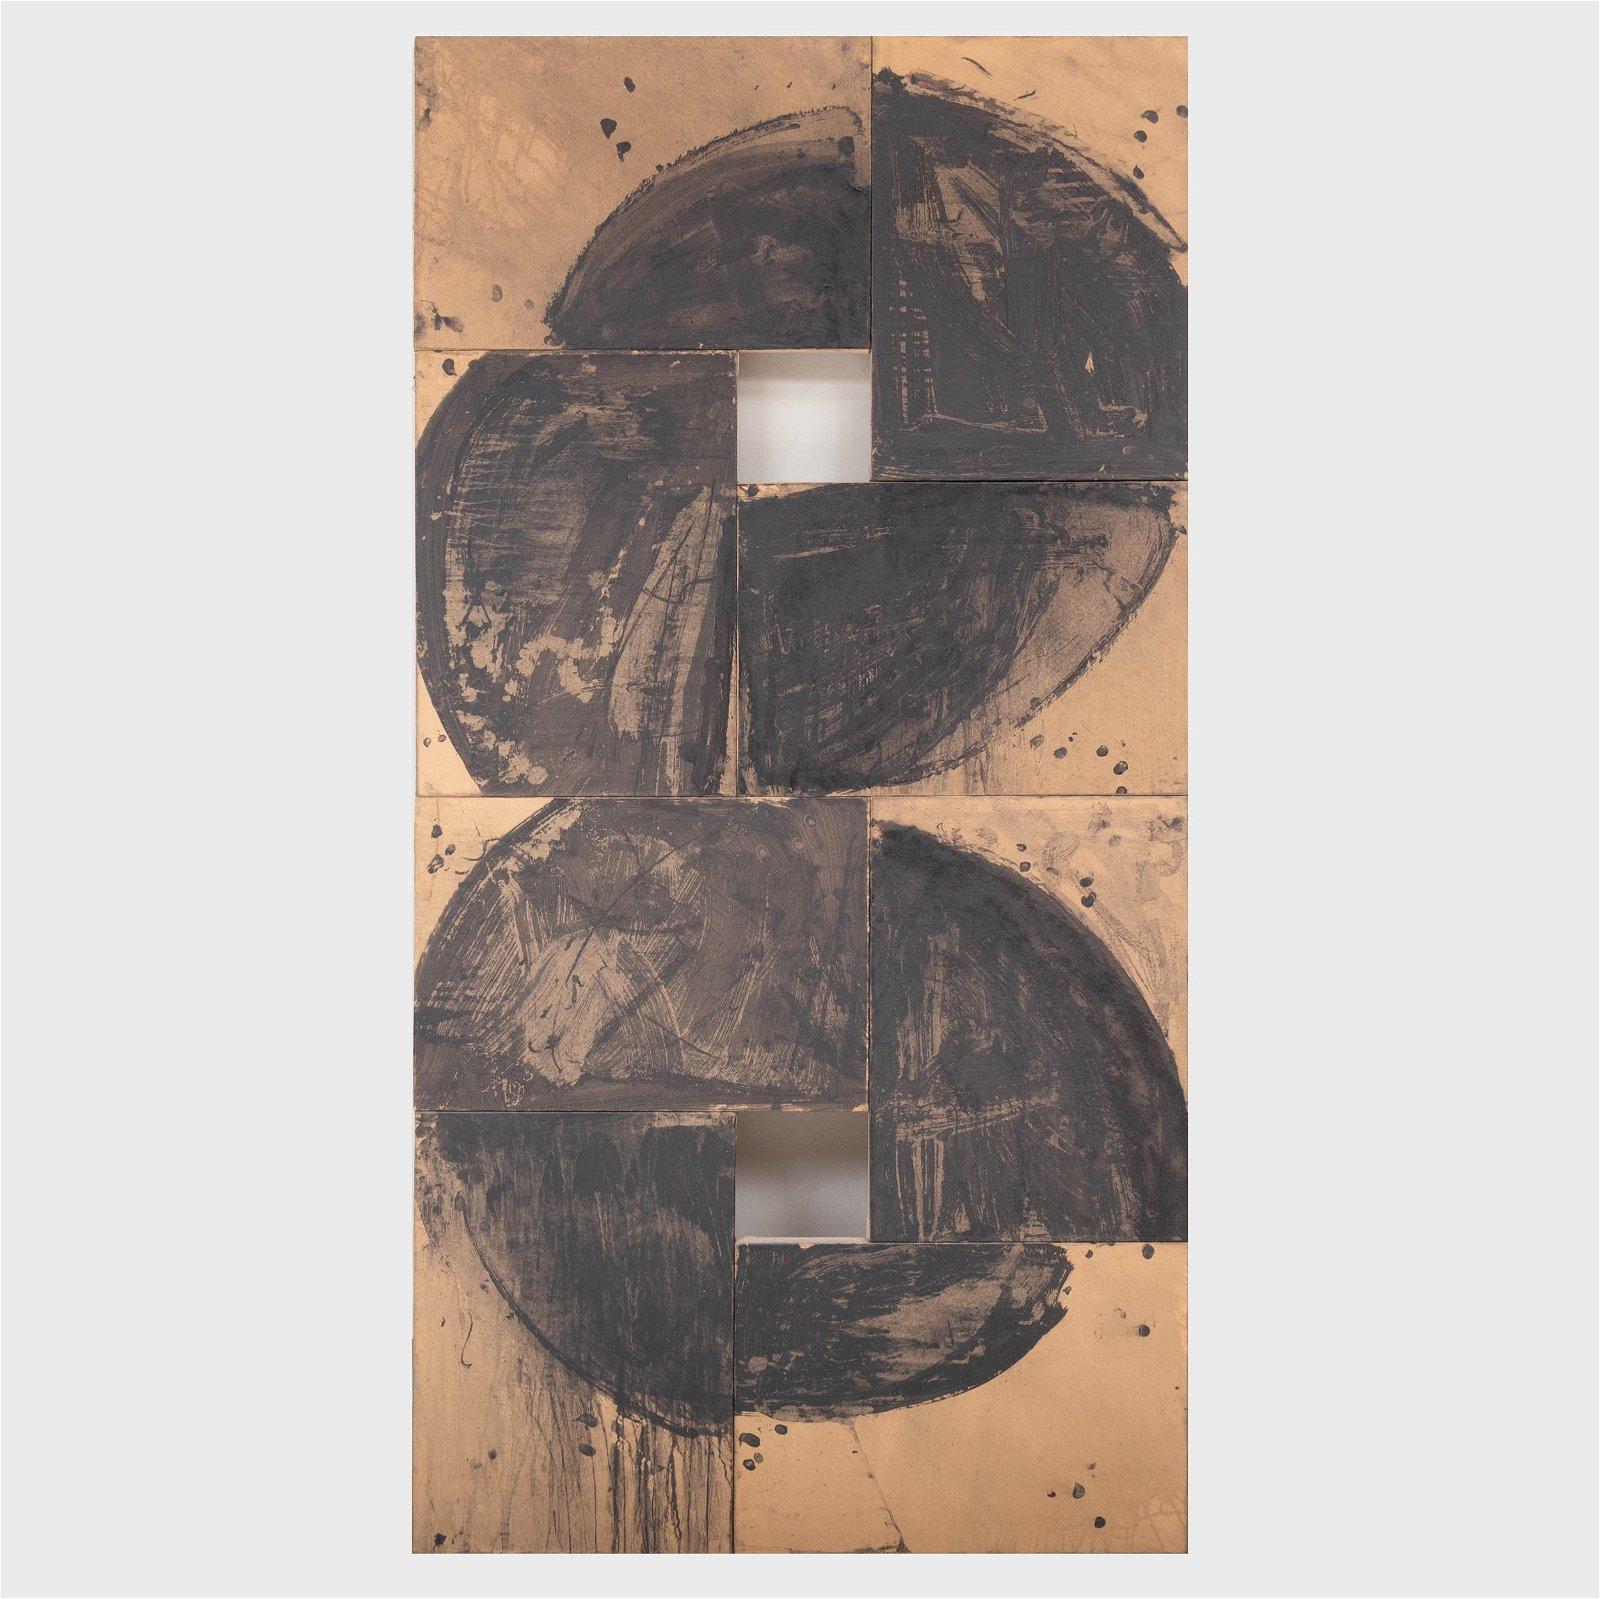 Serge Spitzer (1951-2012): About Sculpture